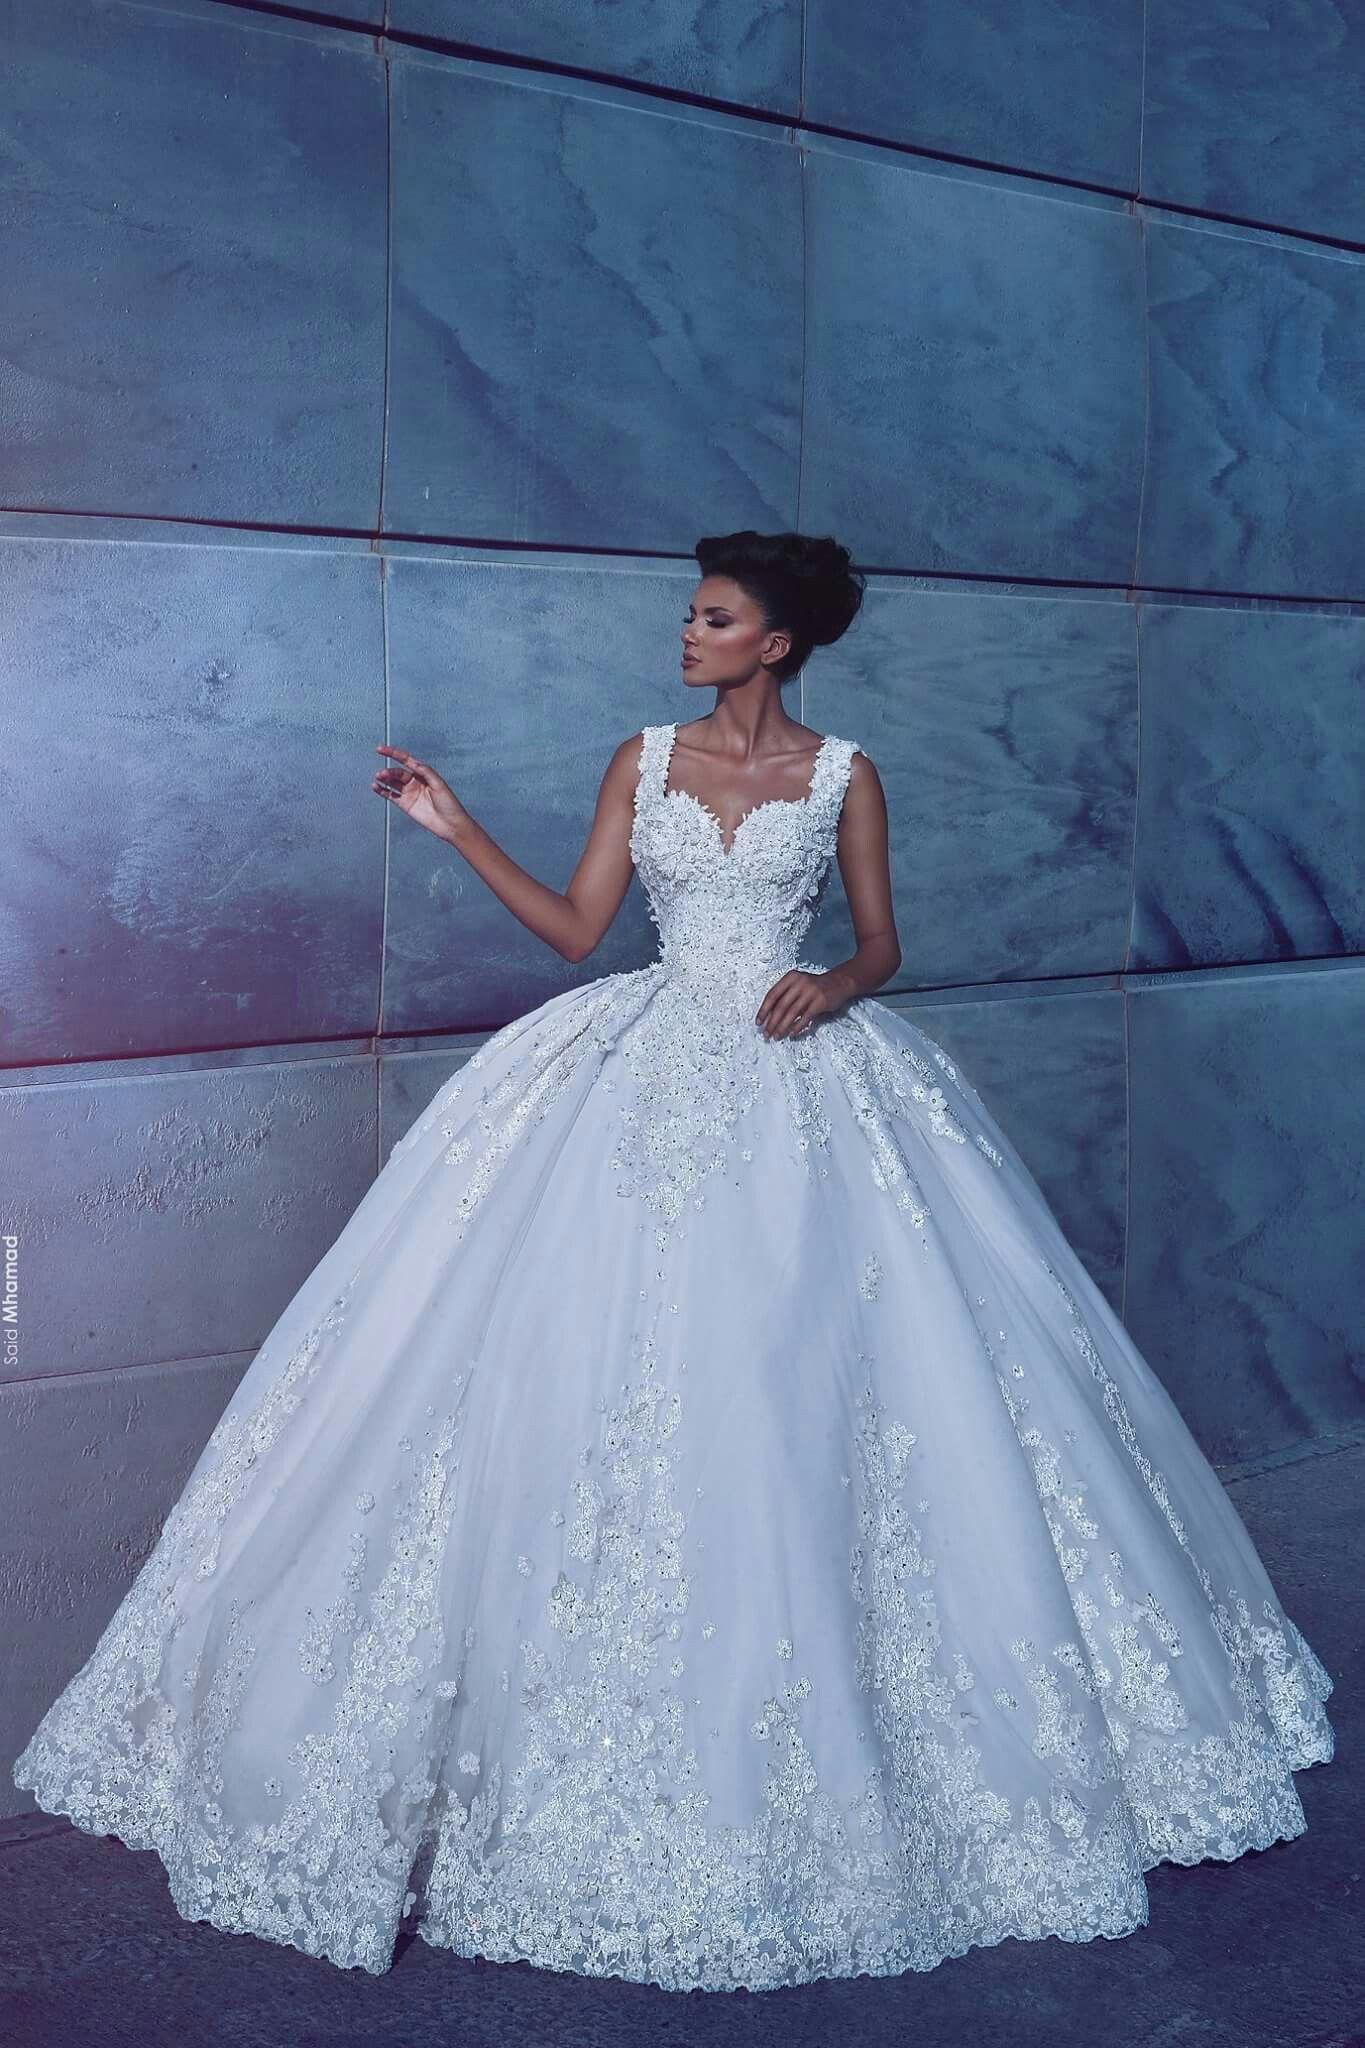 Pin by Ashkhen Alagulyan on dresses | Pinterest | Wedding dress ...